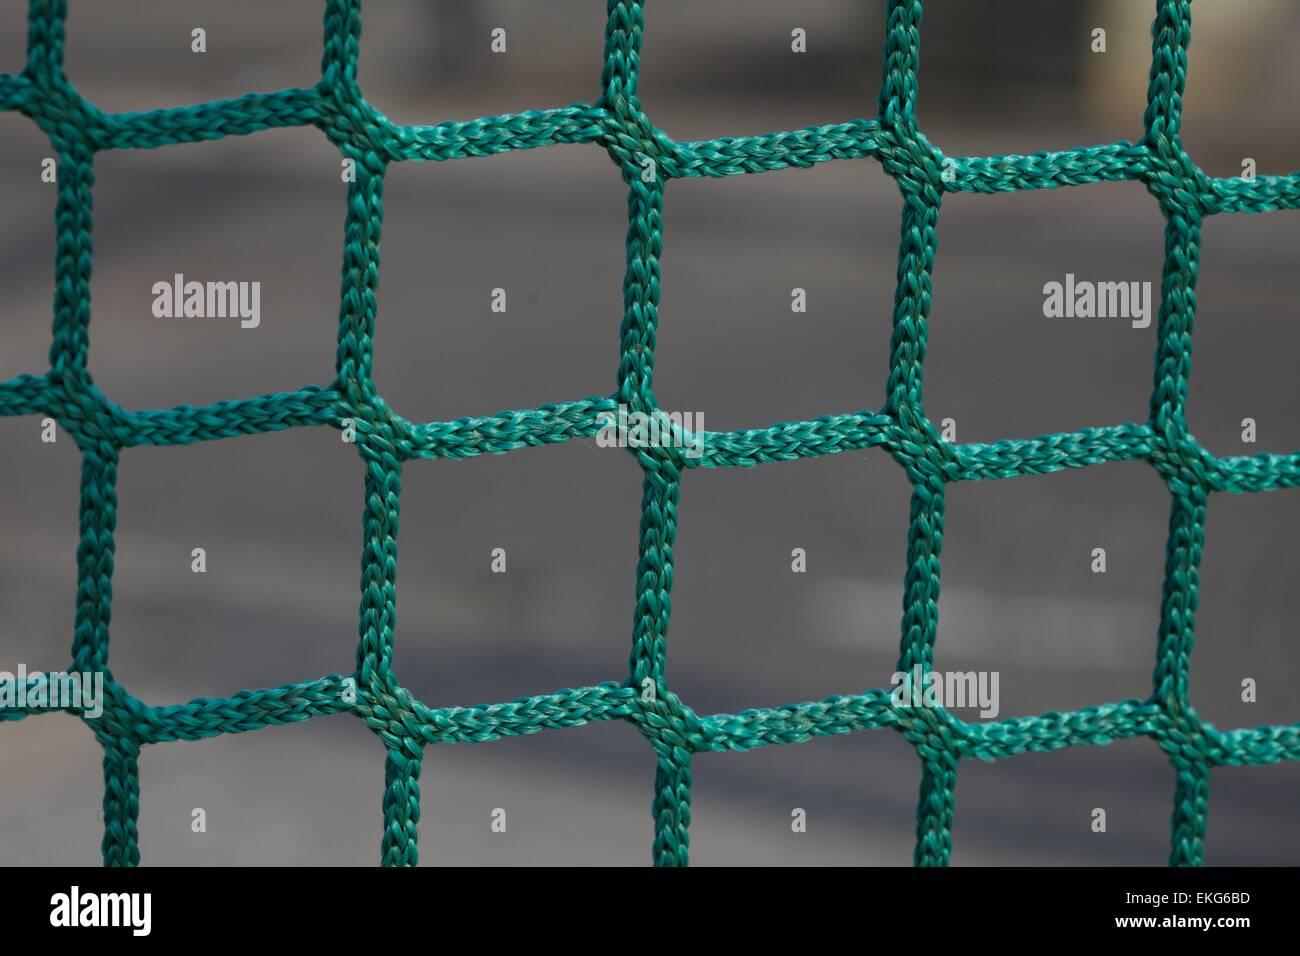 Green Netting Stockfotos & Green Netting Bilder - Alamy